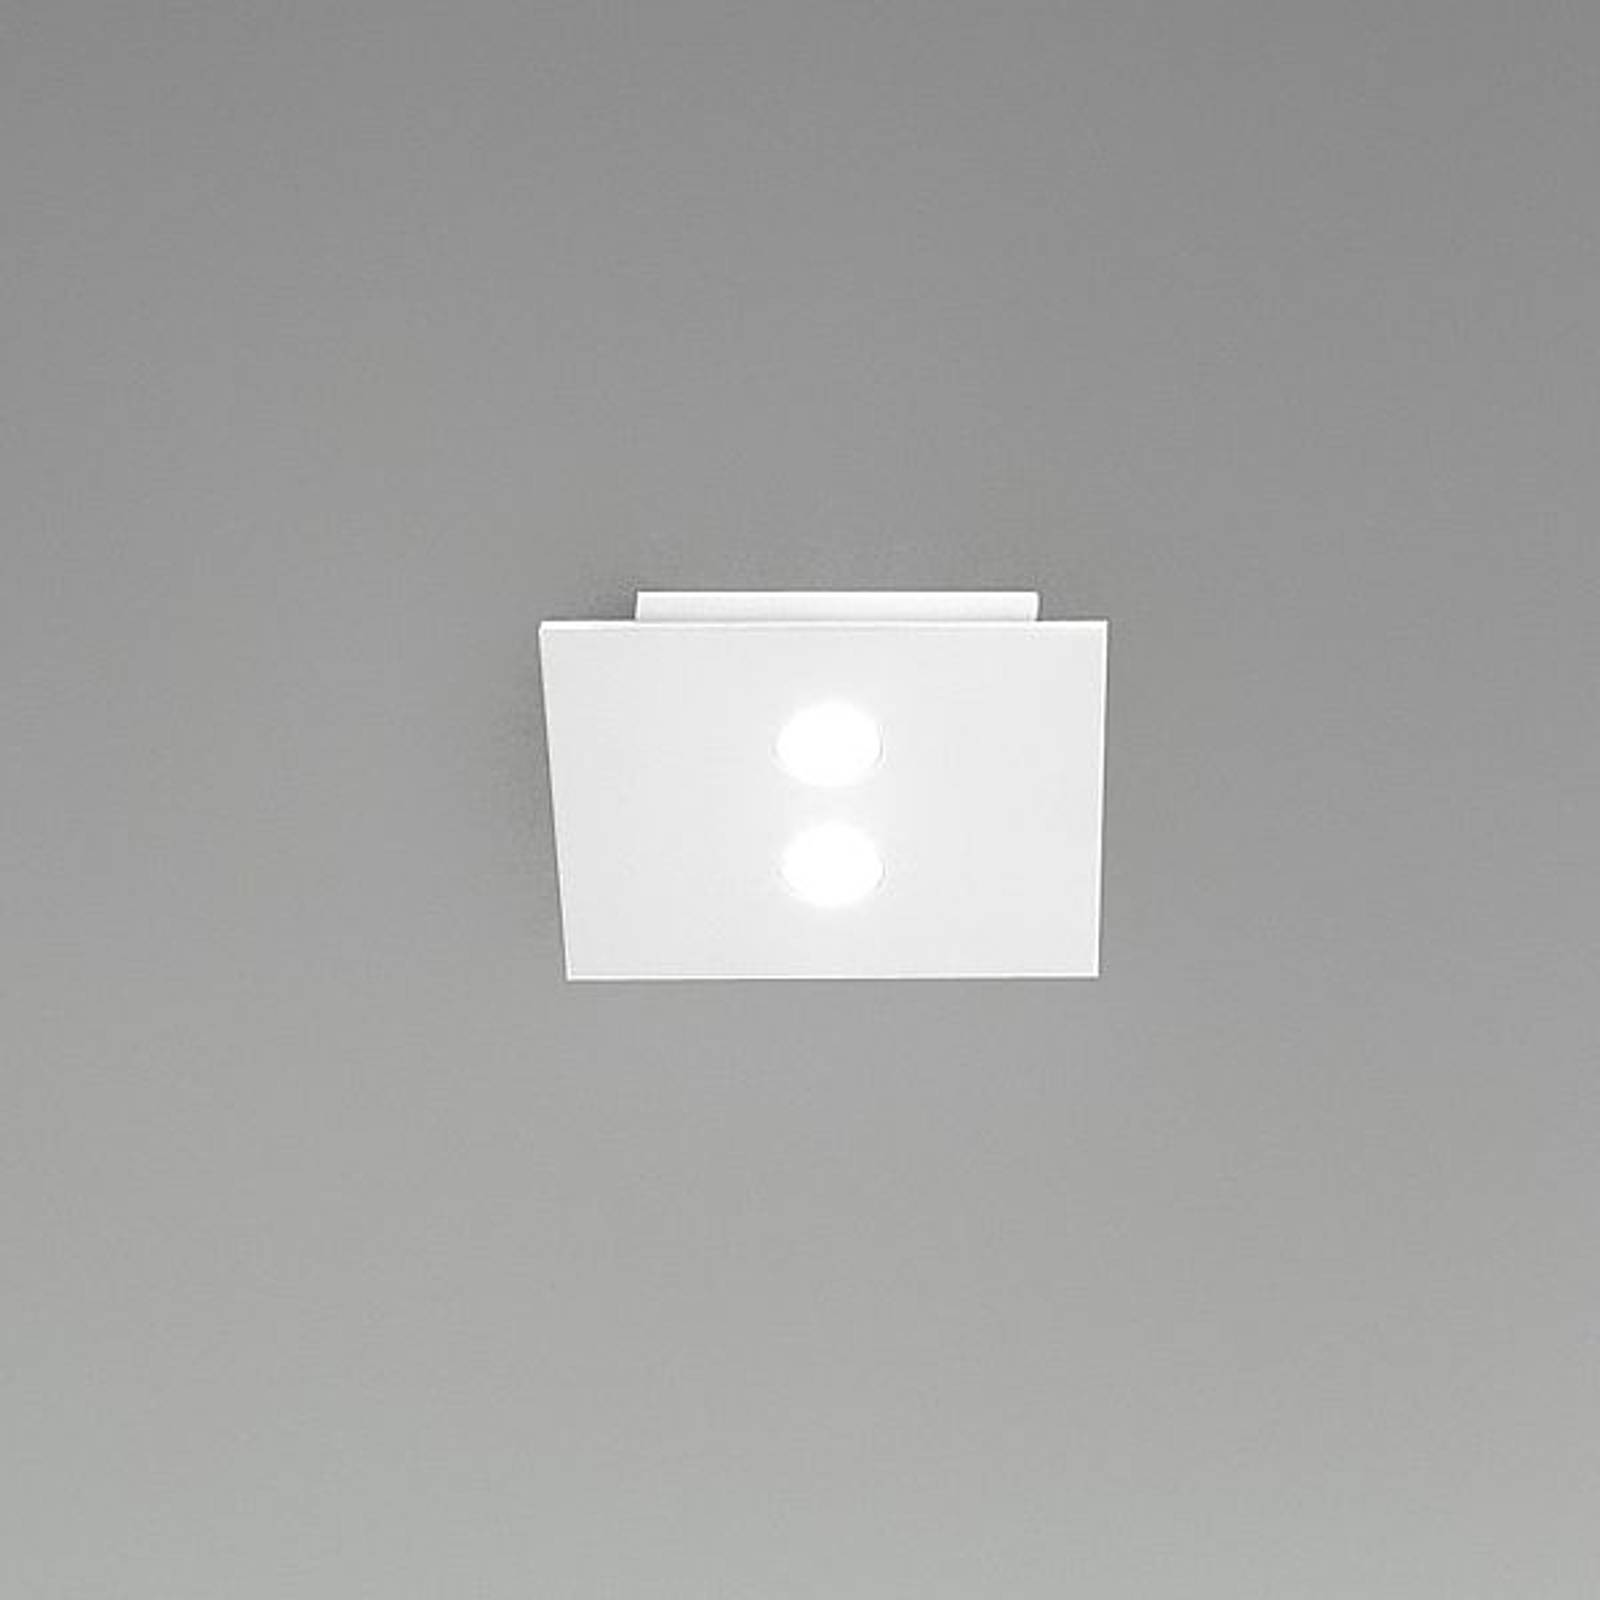 ICONE Slim - pieni LED-kattovalaisin, 2-lamppuinen